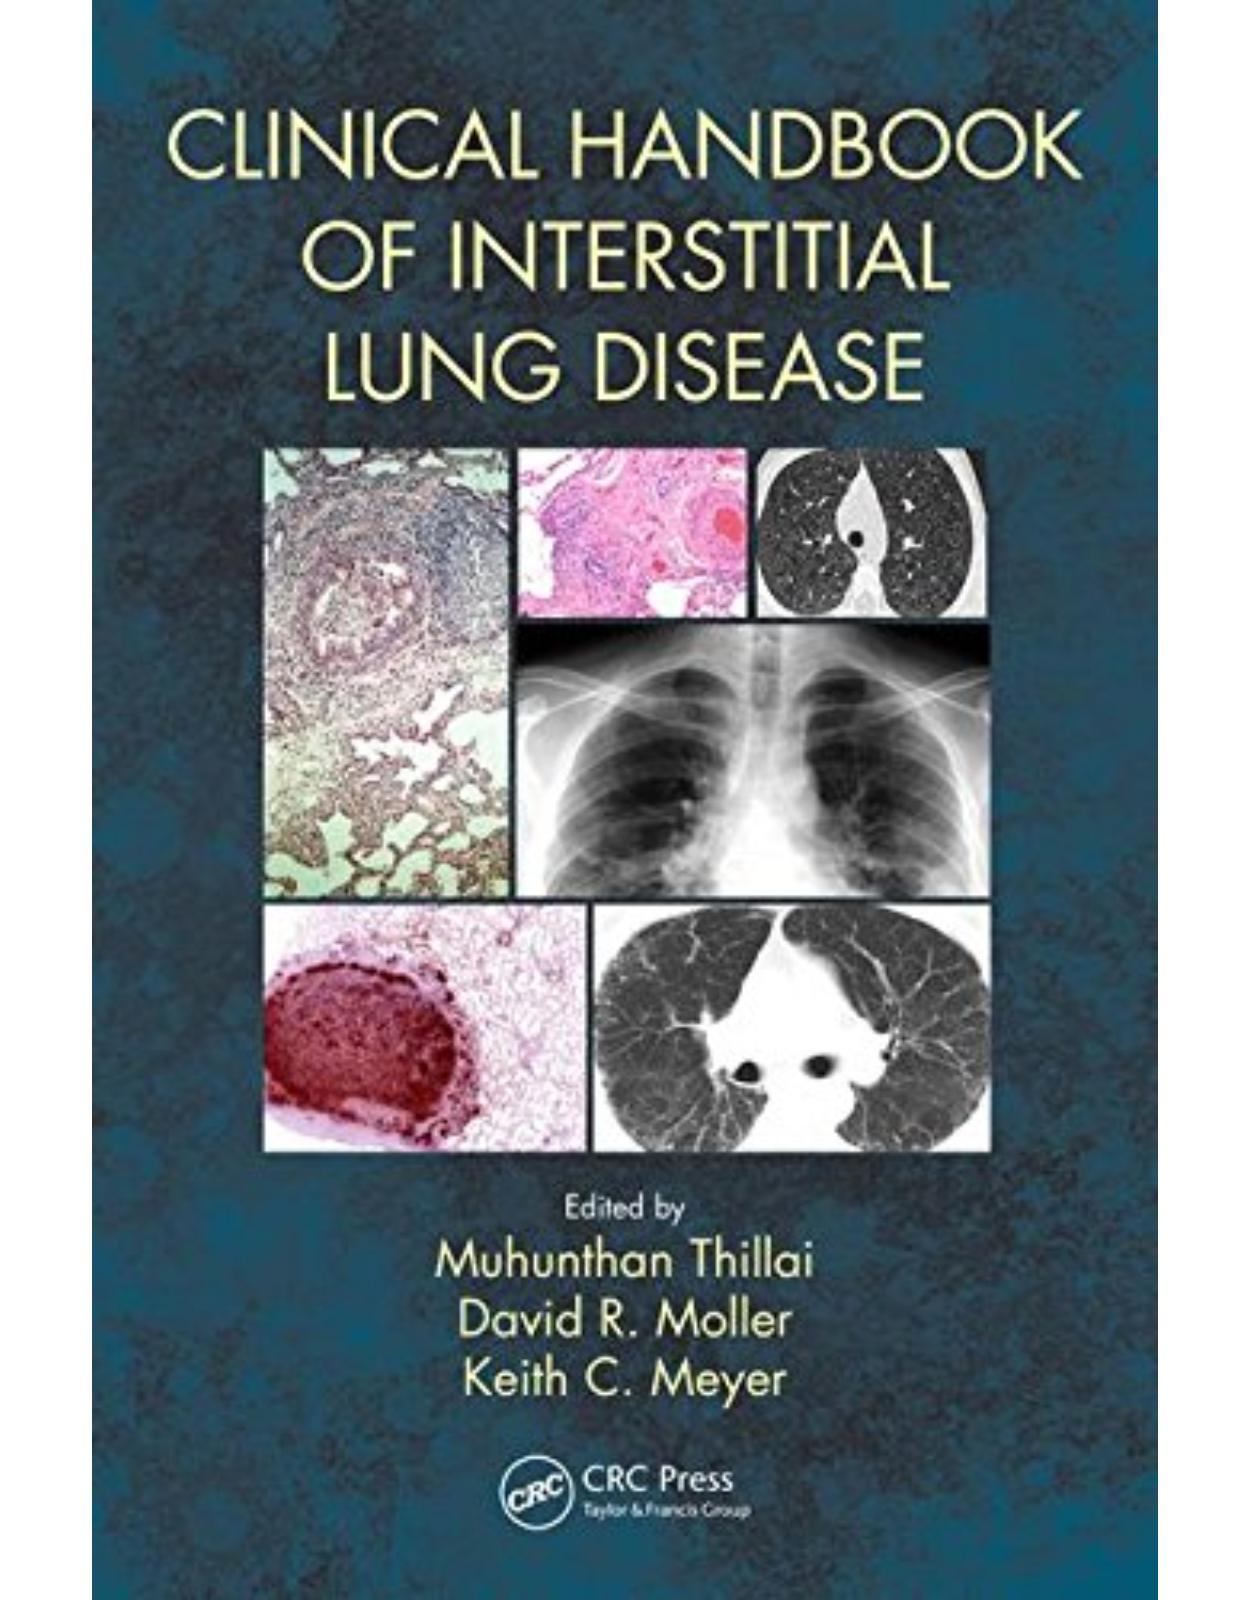 Clinical Handbook of Interstitial Lung Disease